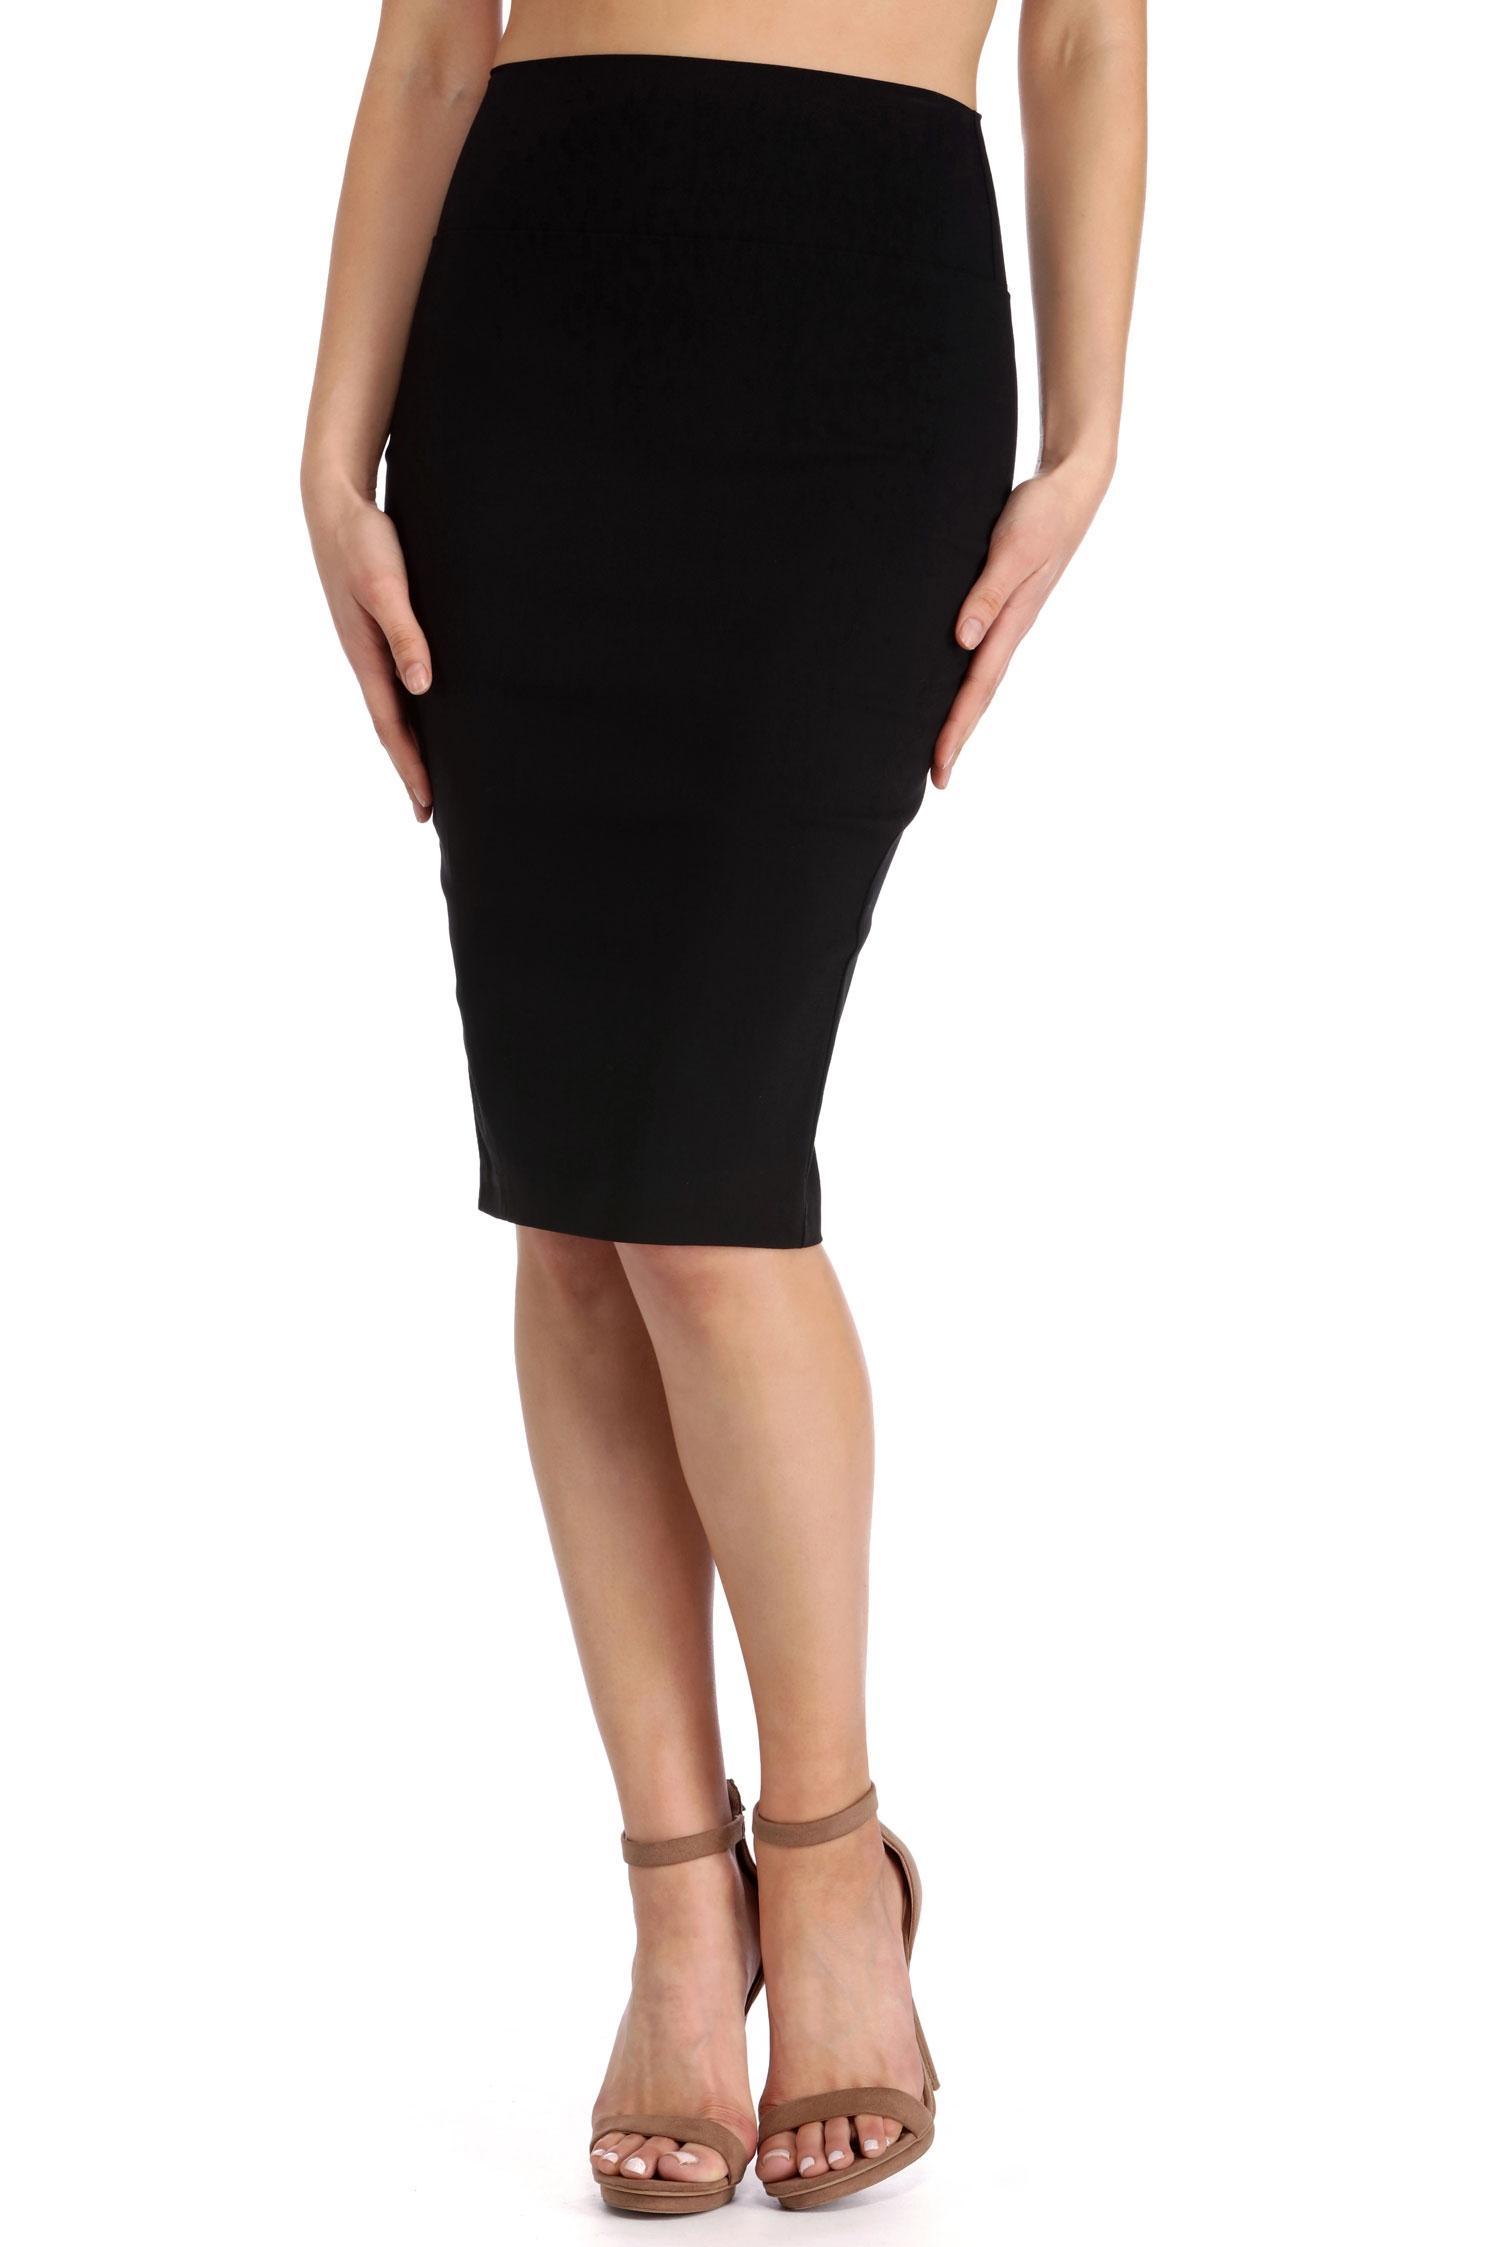 black high waisted skirt black high waisted pencil skirt AXFBXTF